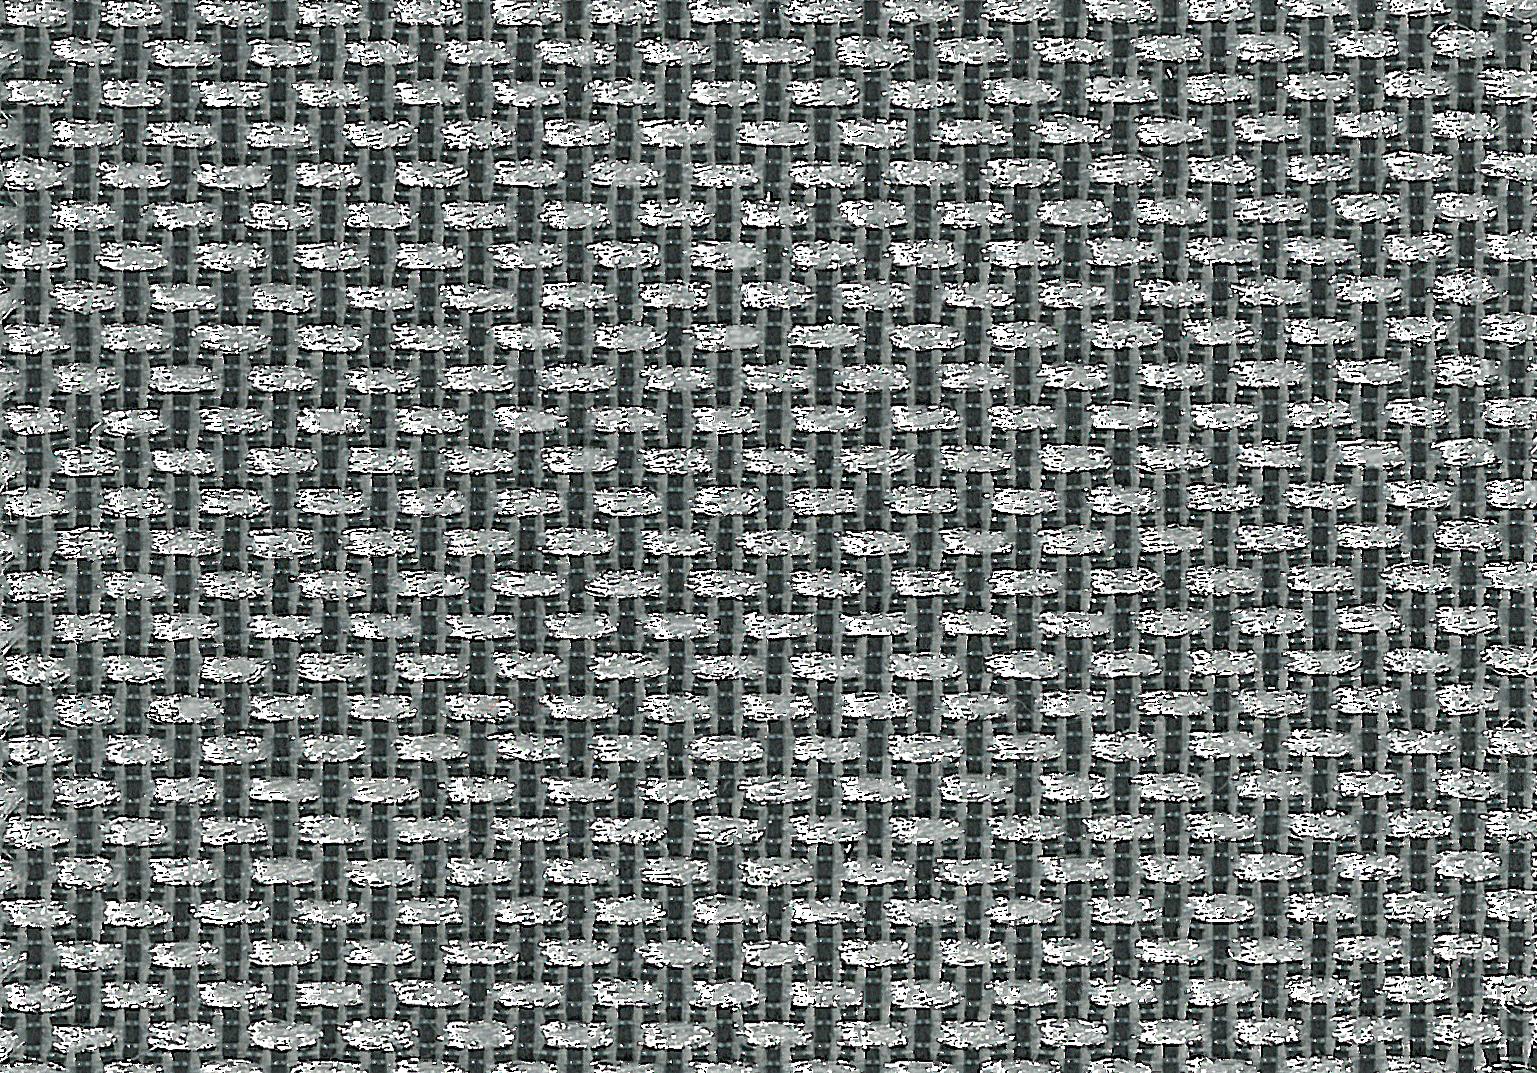 KR-4921.16